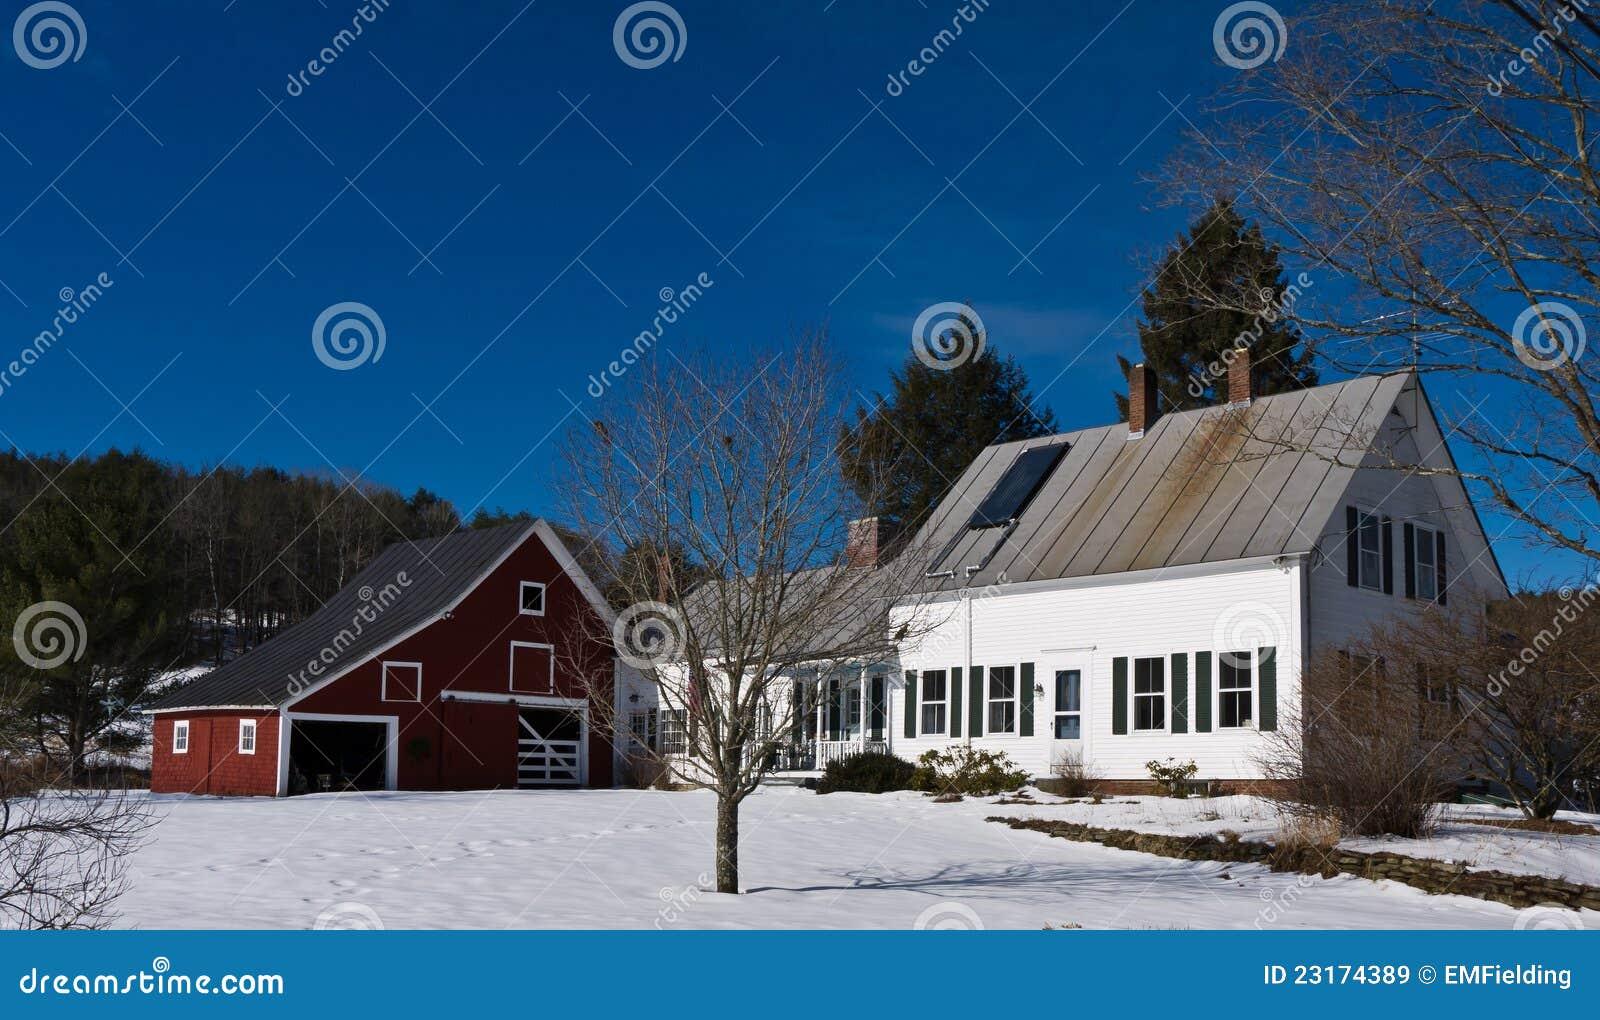 New England Farm House Barn Stock Image - Image: 23174389